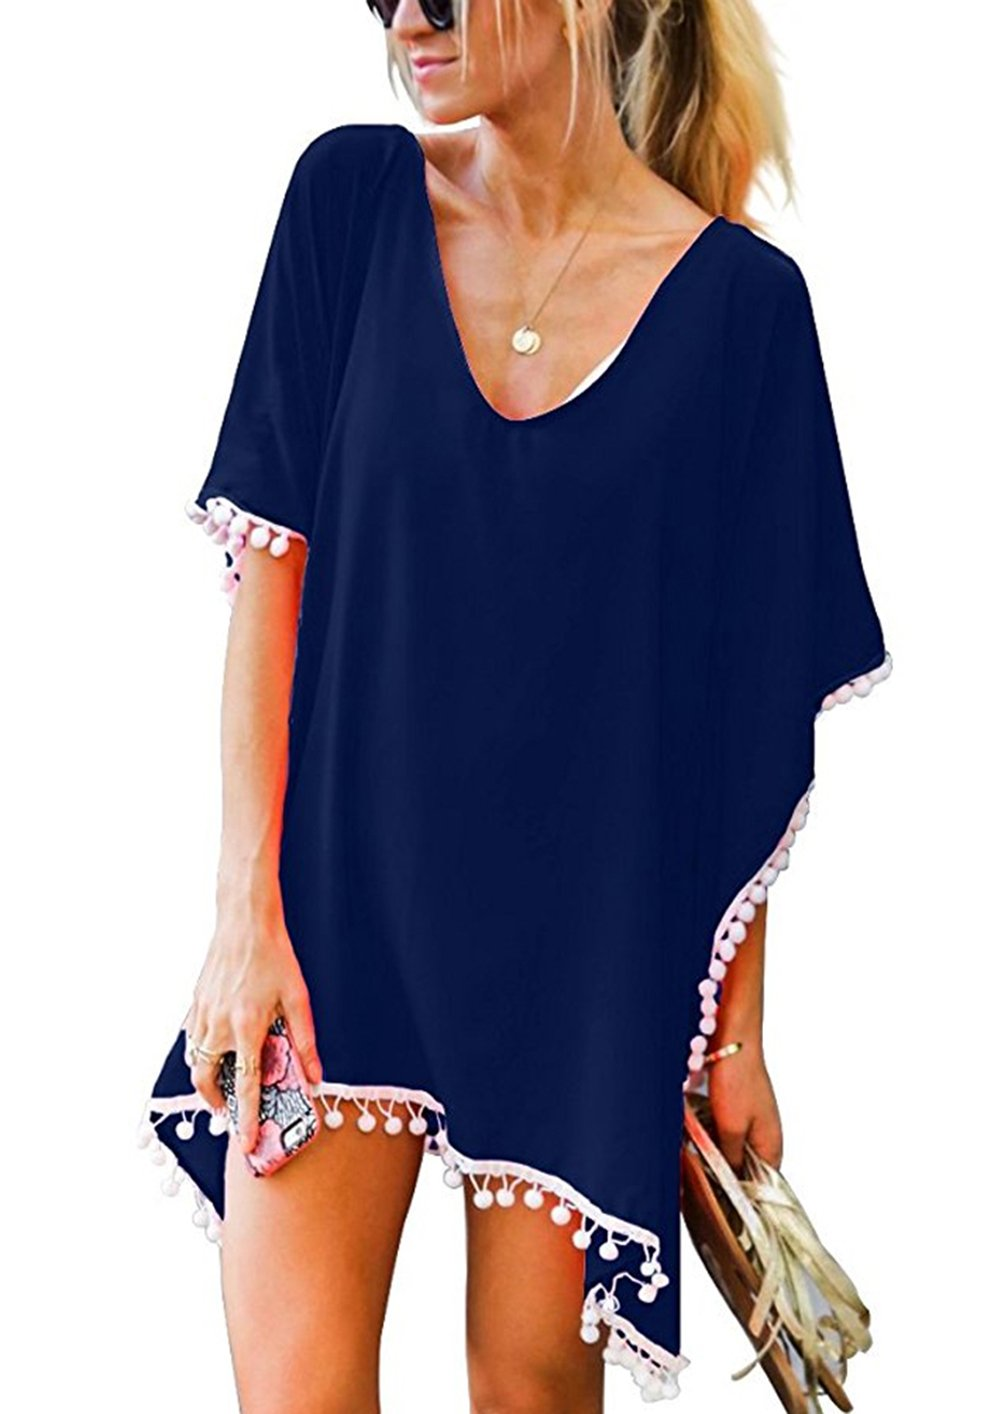 FIRSTLIKE Women's Pom Pom Trim Kaftan Chiffon Swimwear Beach Loose Bikini Cover Up Cute Beach Tunic Biquini Tankini Dress